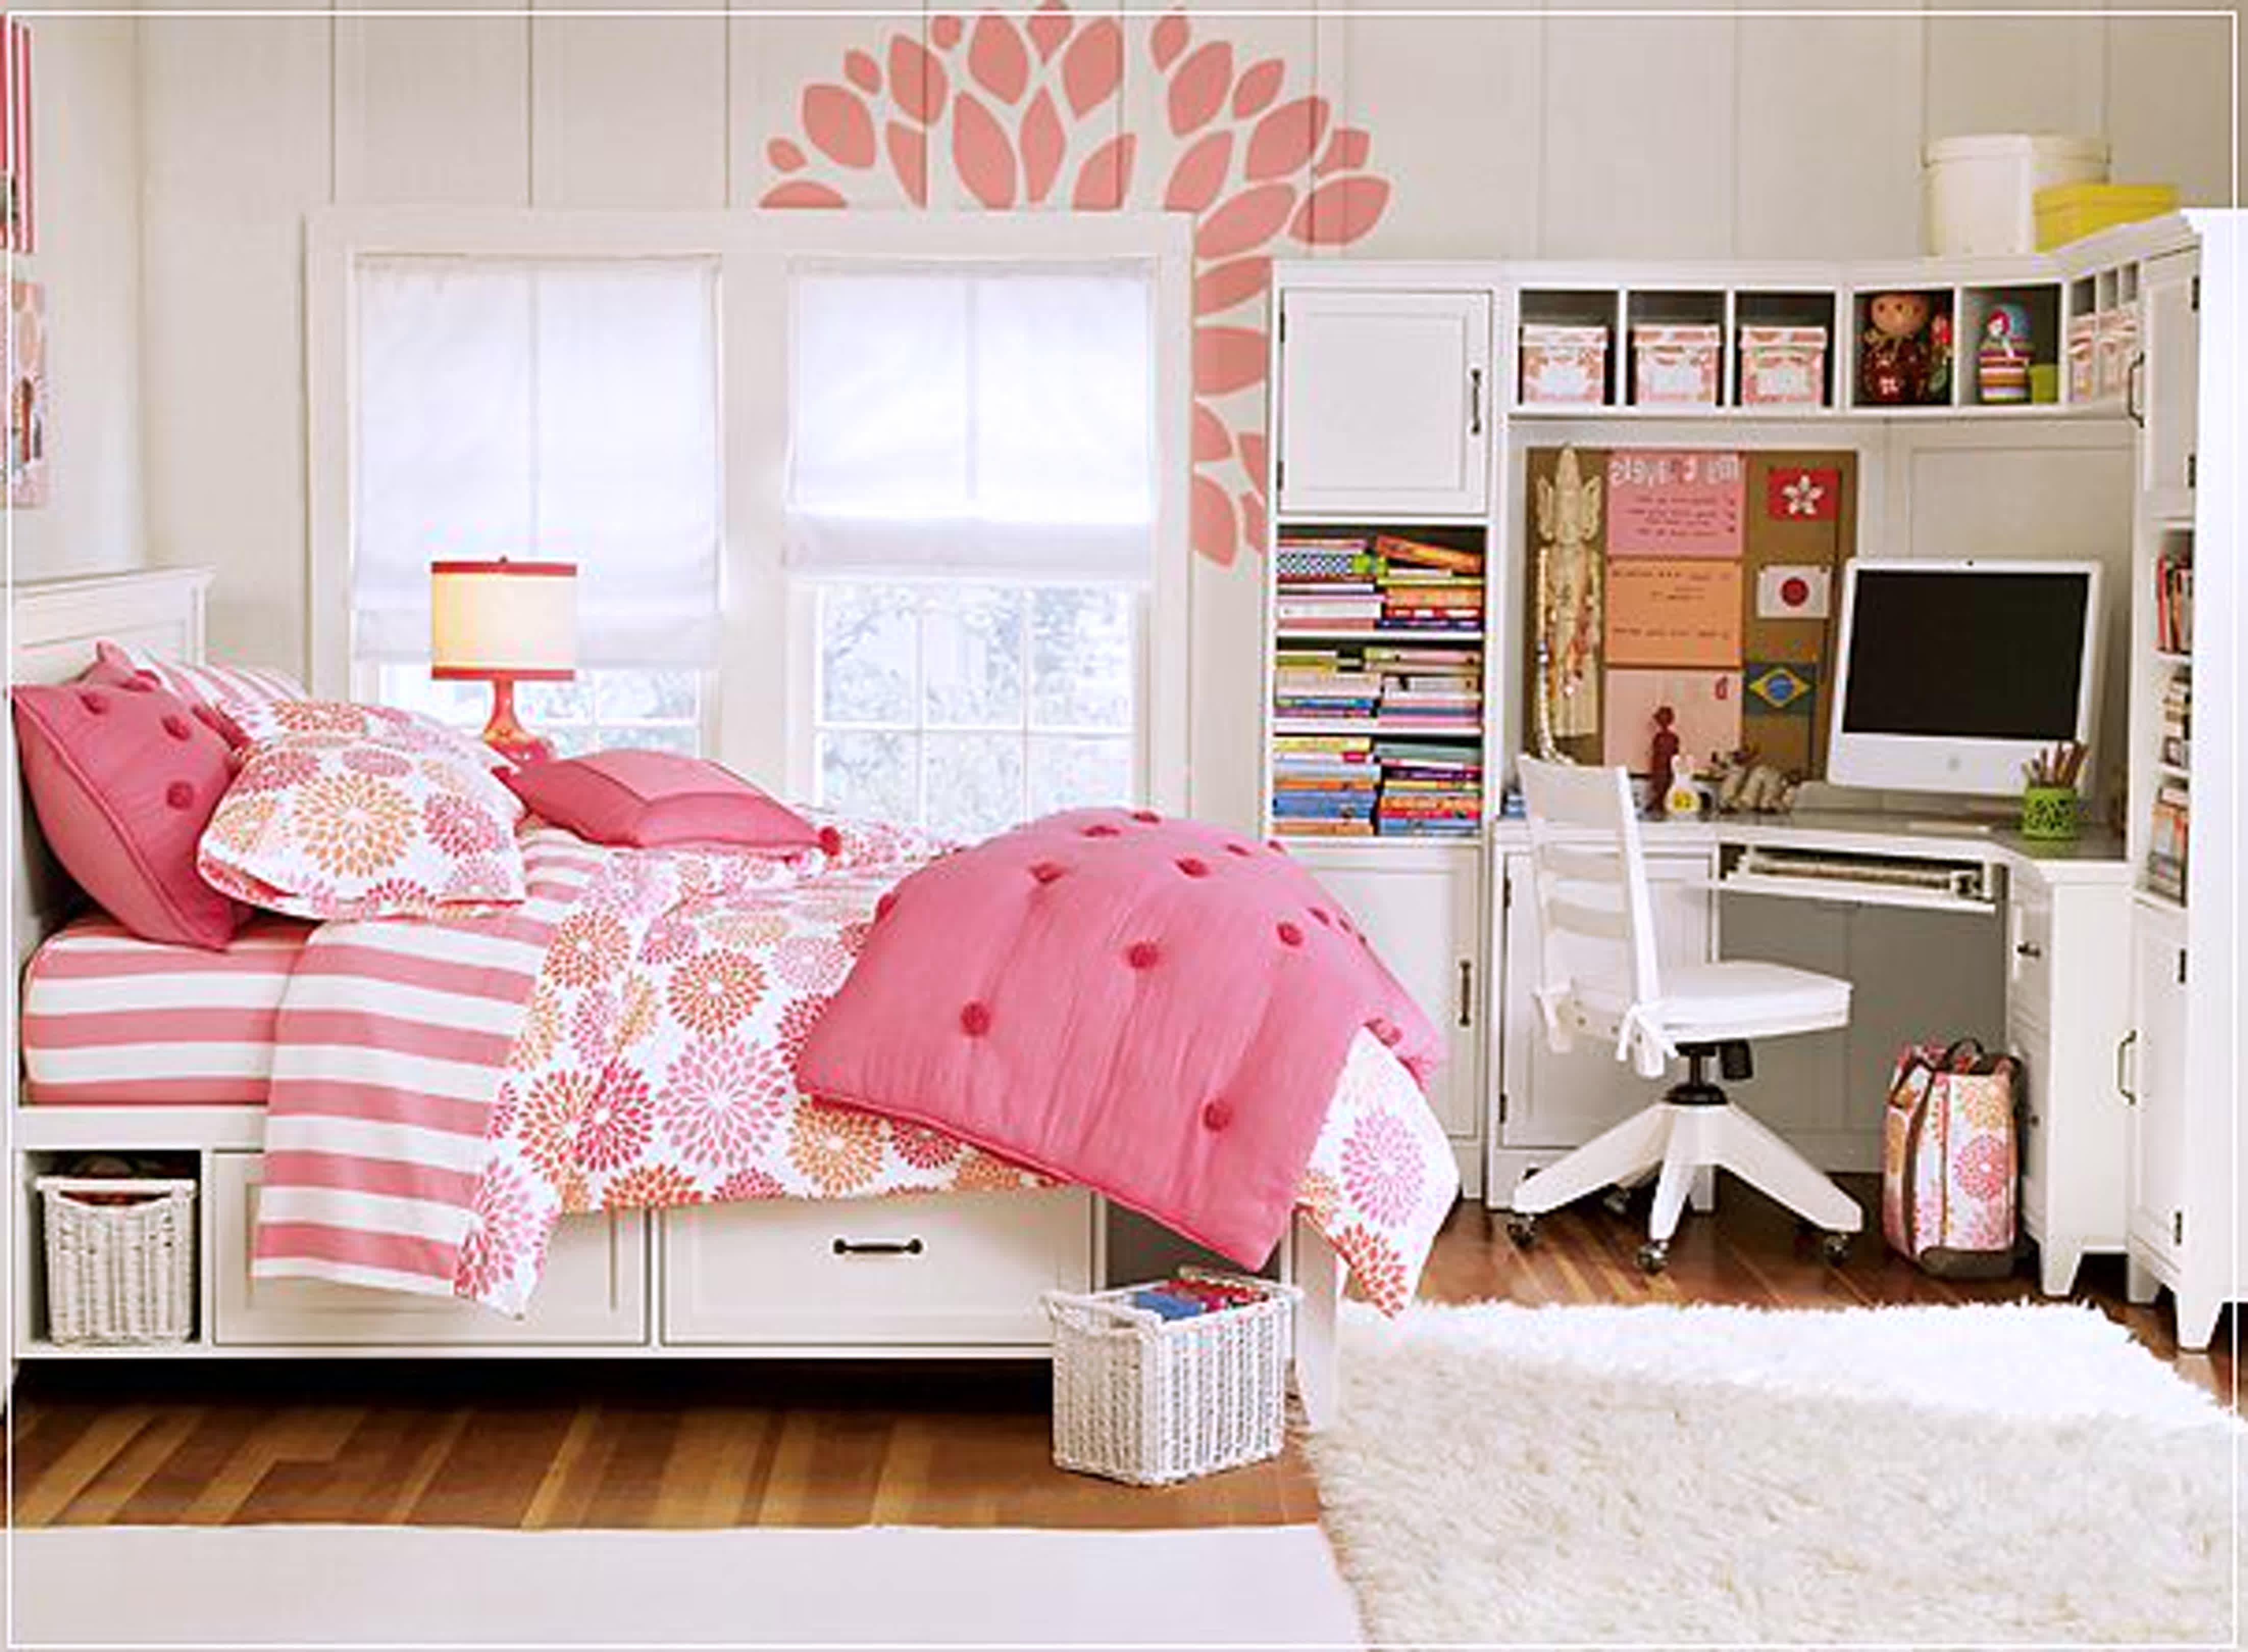 Teen Girl Bedroom Design with Black Furniture, Black And White Teen Bedroom Bedroom In 2019